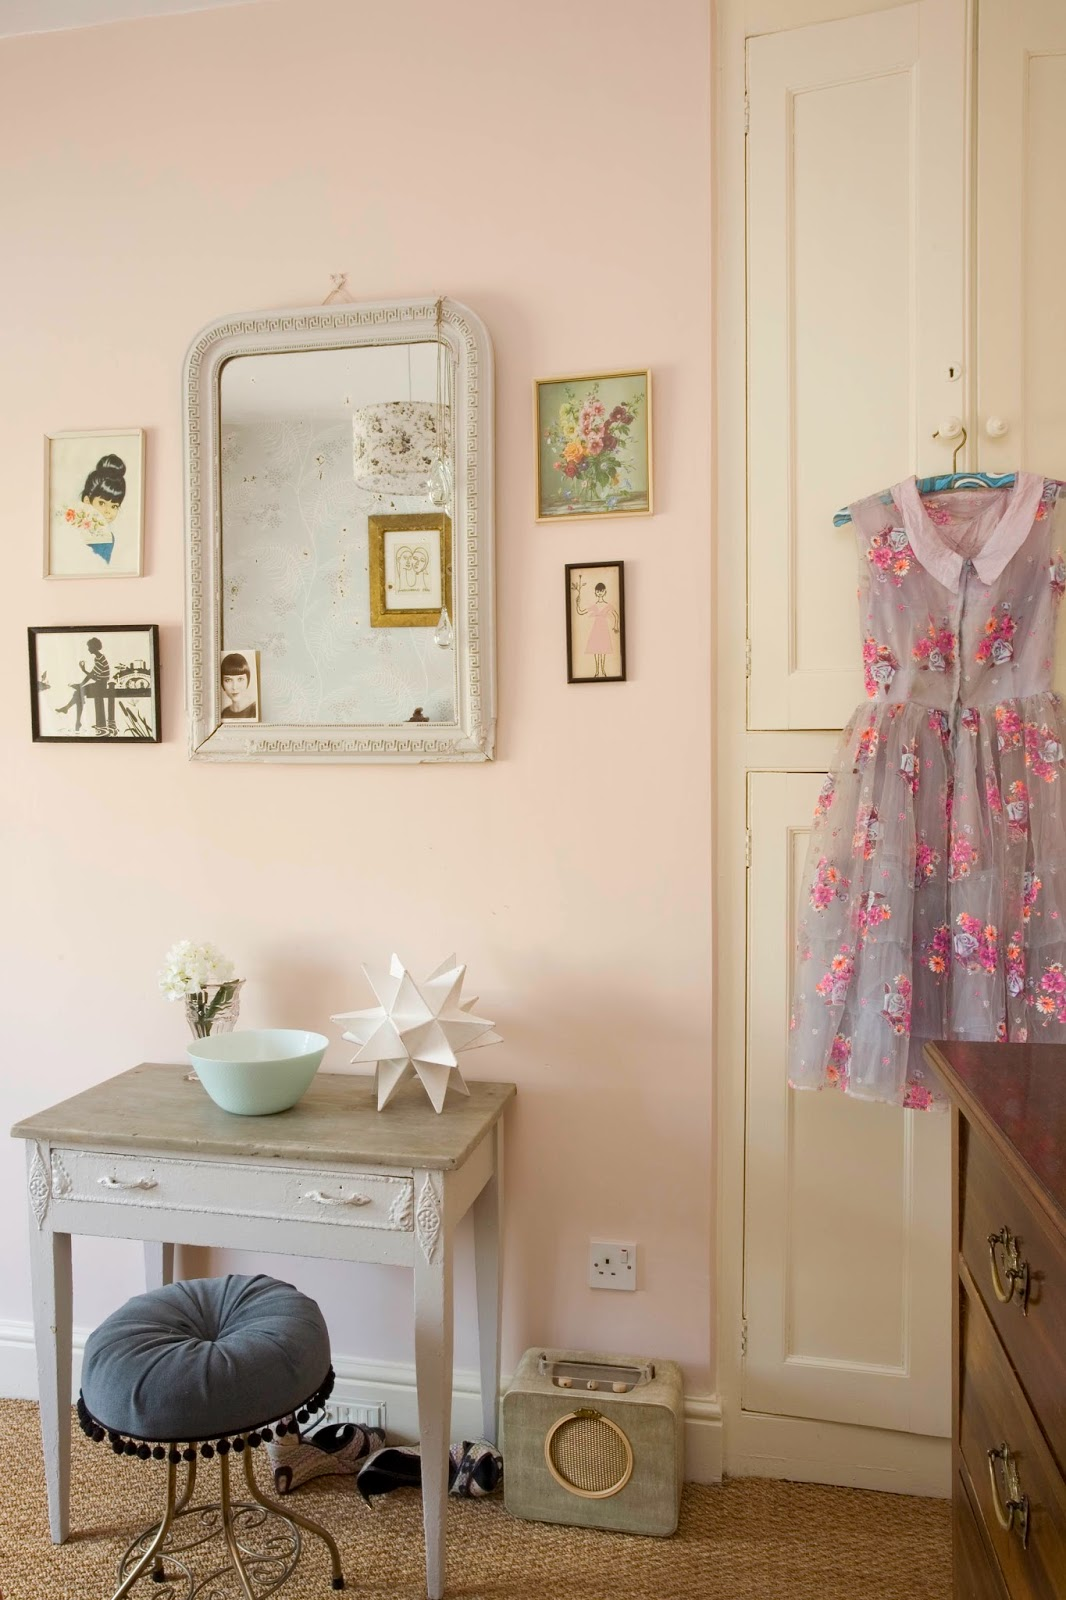 karen barlow farrow and ball paint colour trend 2015 pink. Black Bedroom Furniture Sets. Home Design Ideas